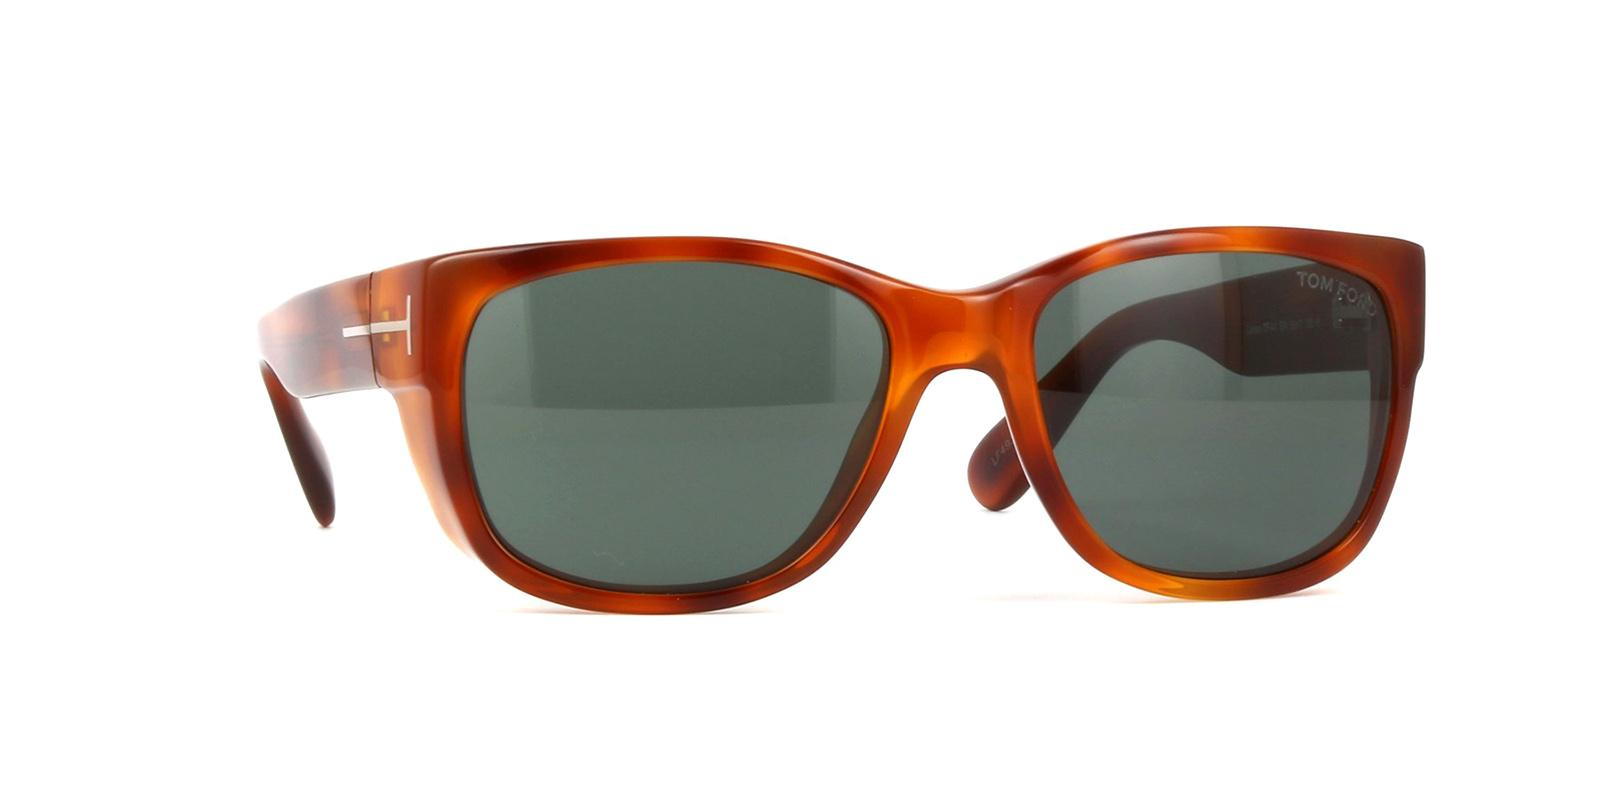 Tom Ford Men's Square Sunglasses